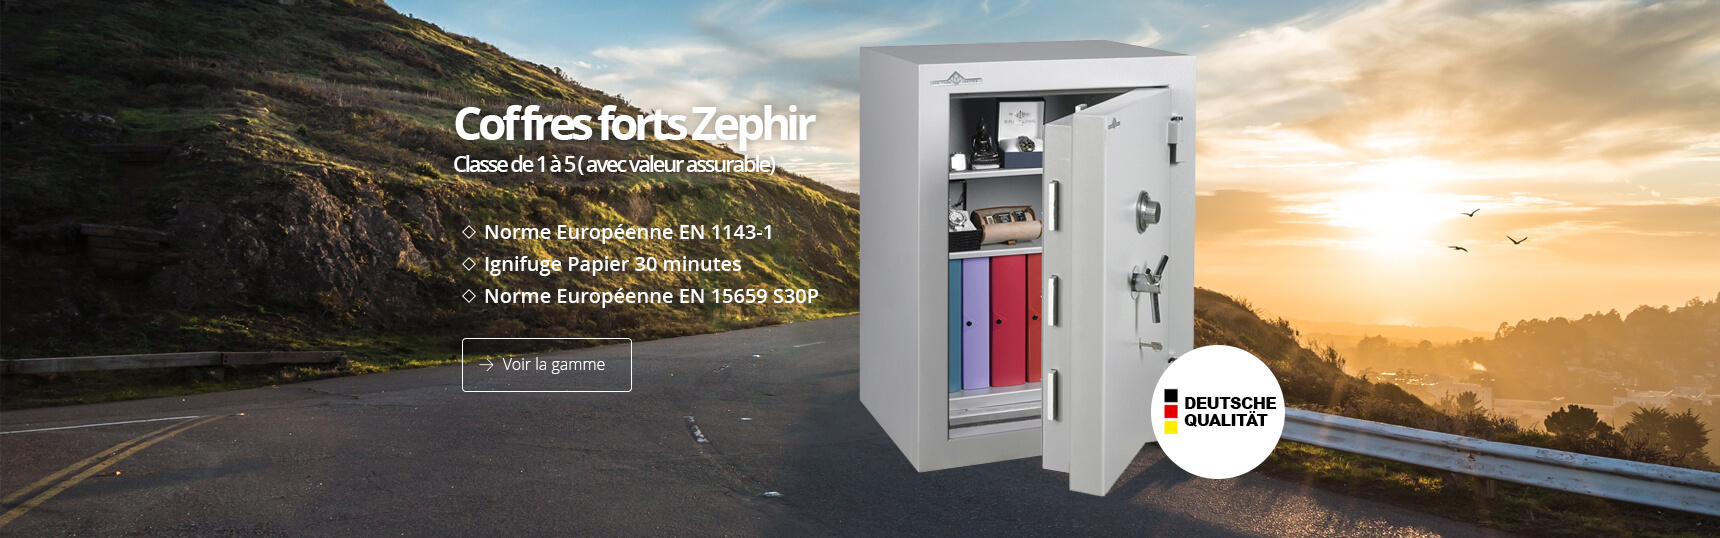 Coffre fort Zephir